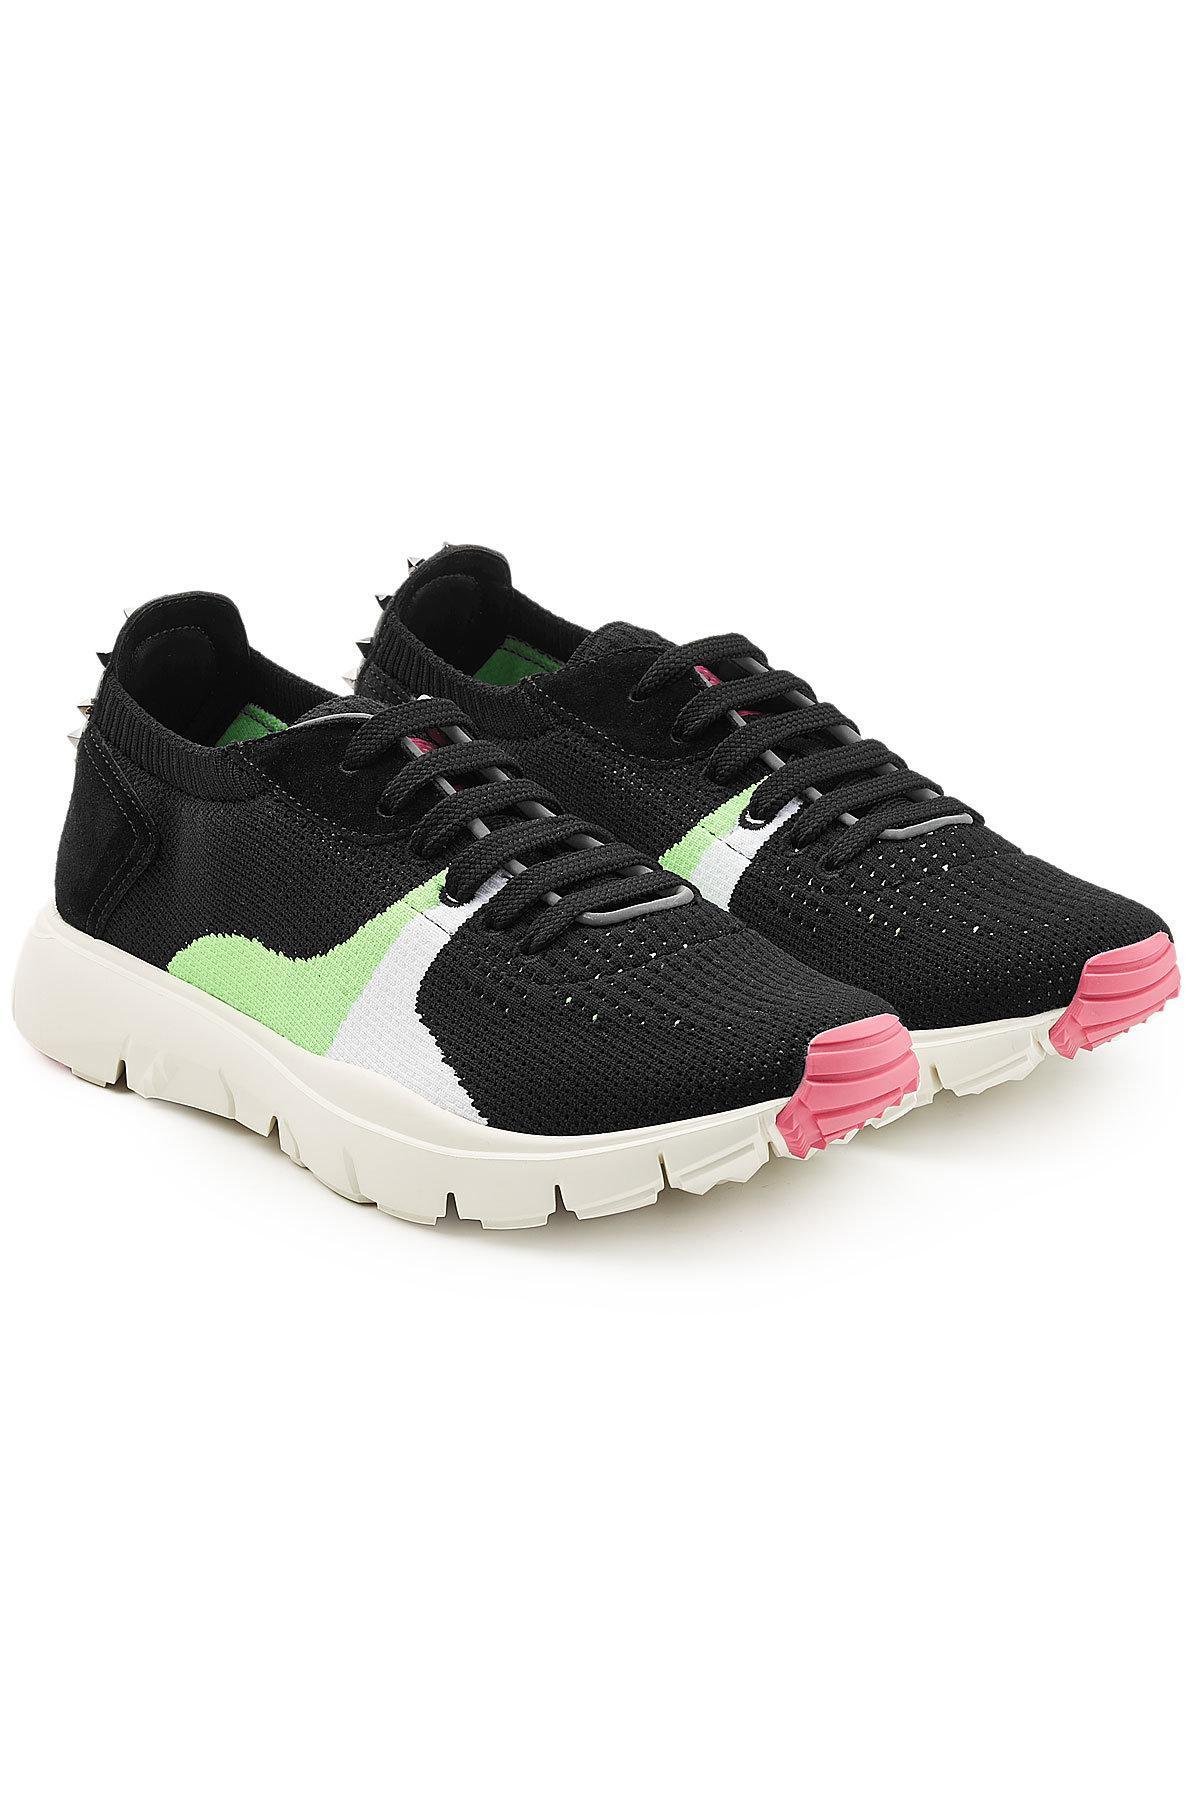 ValentinoKnit Low Sneakers